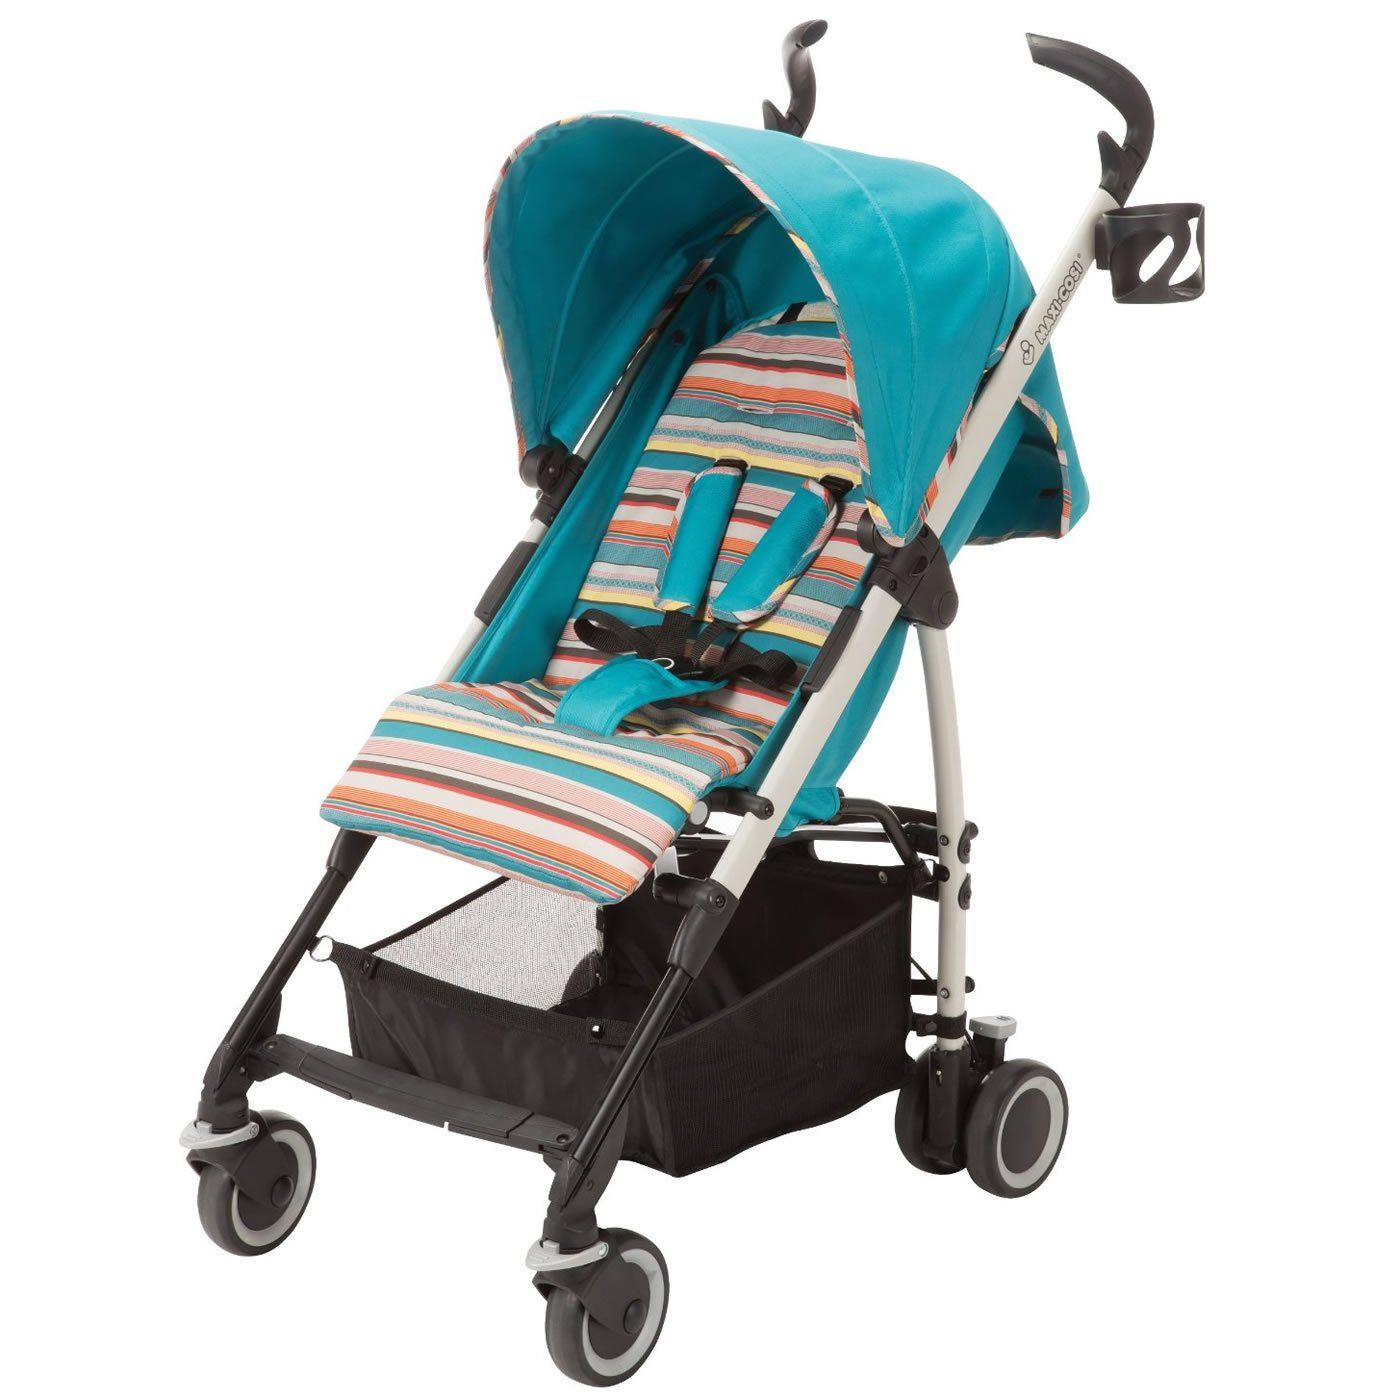 MaxiCosi Kaia Stroller, Bohemian Blue (With images